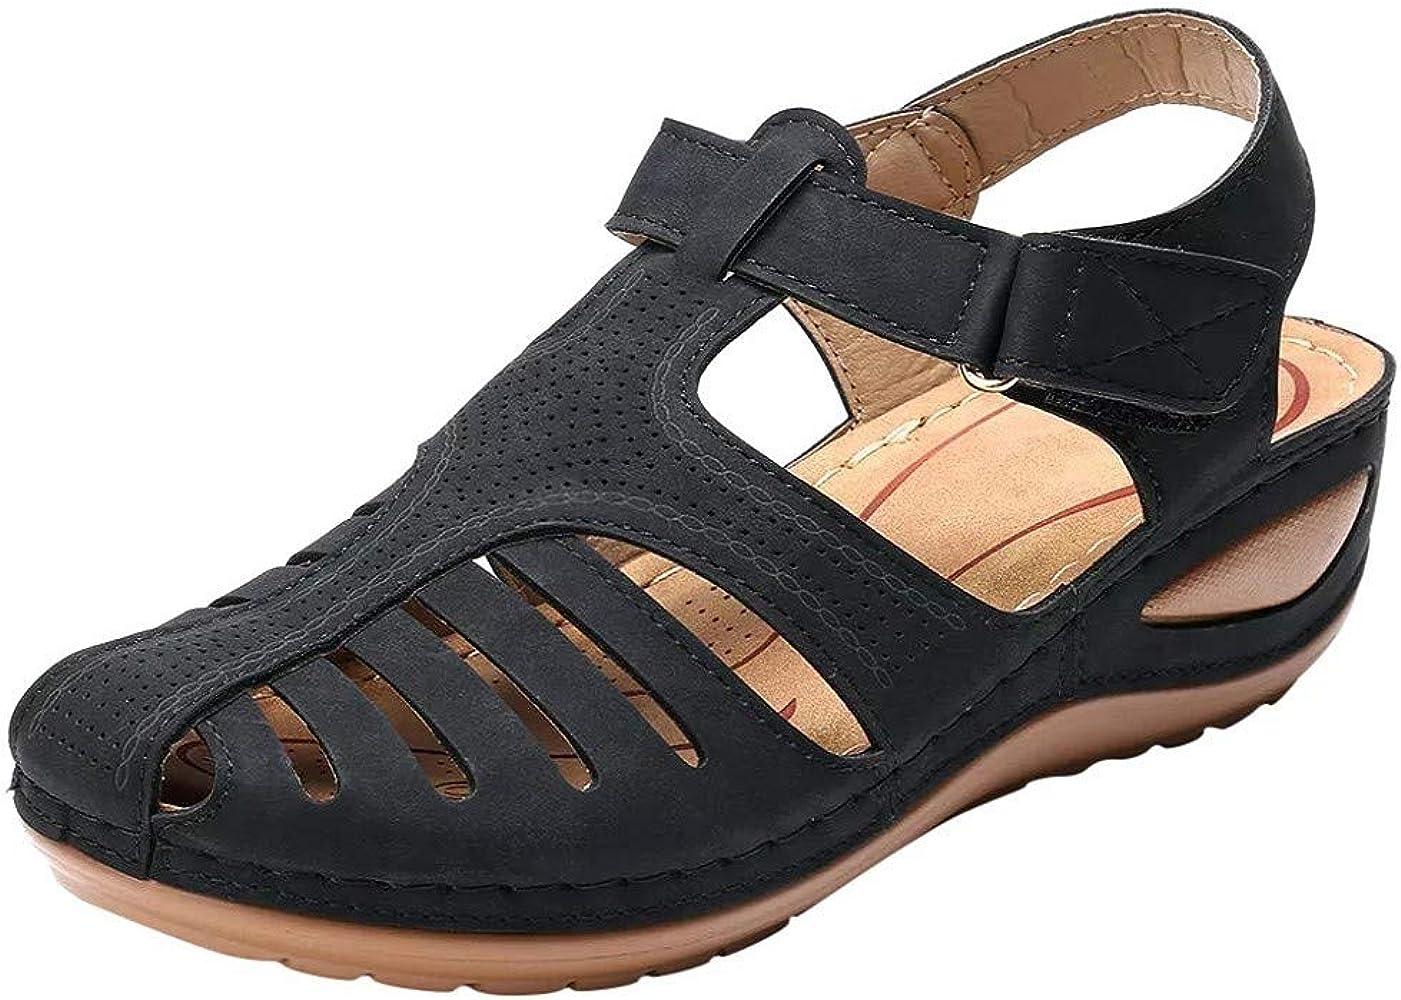 Women's Closed Toe Wedges Shoes Sandals